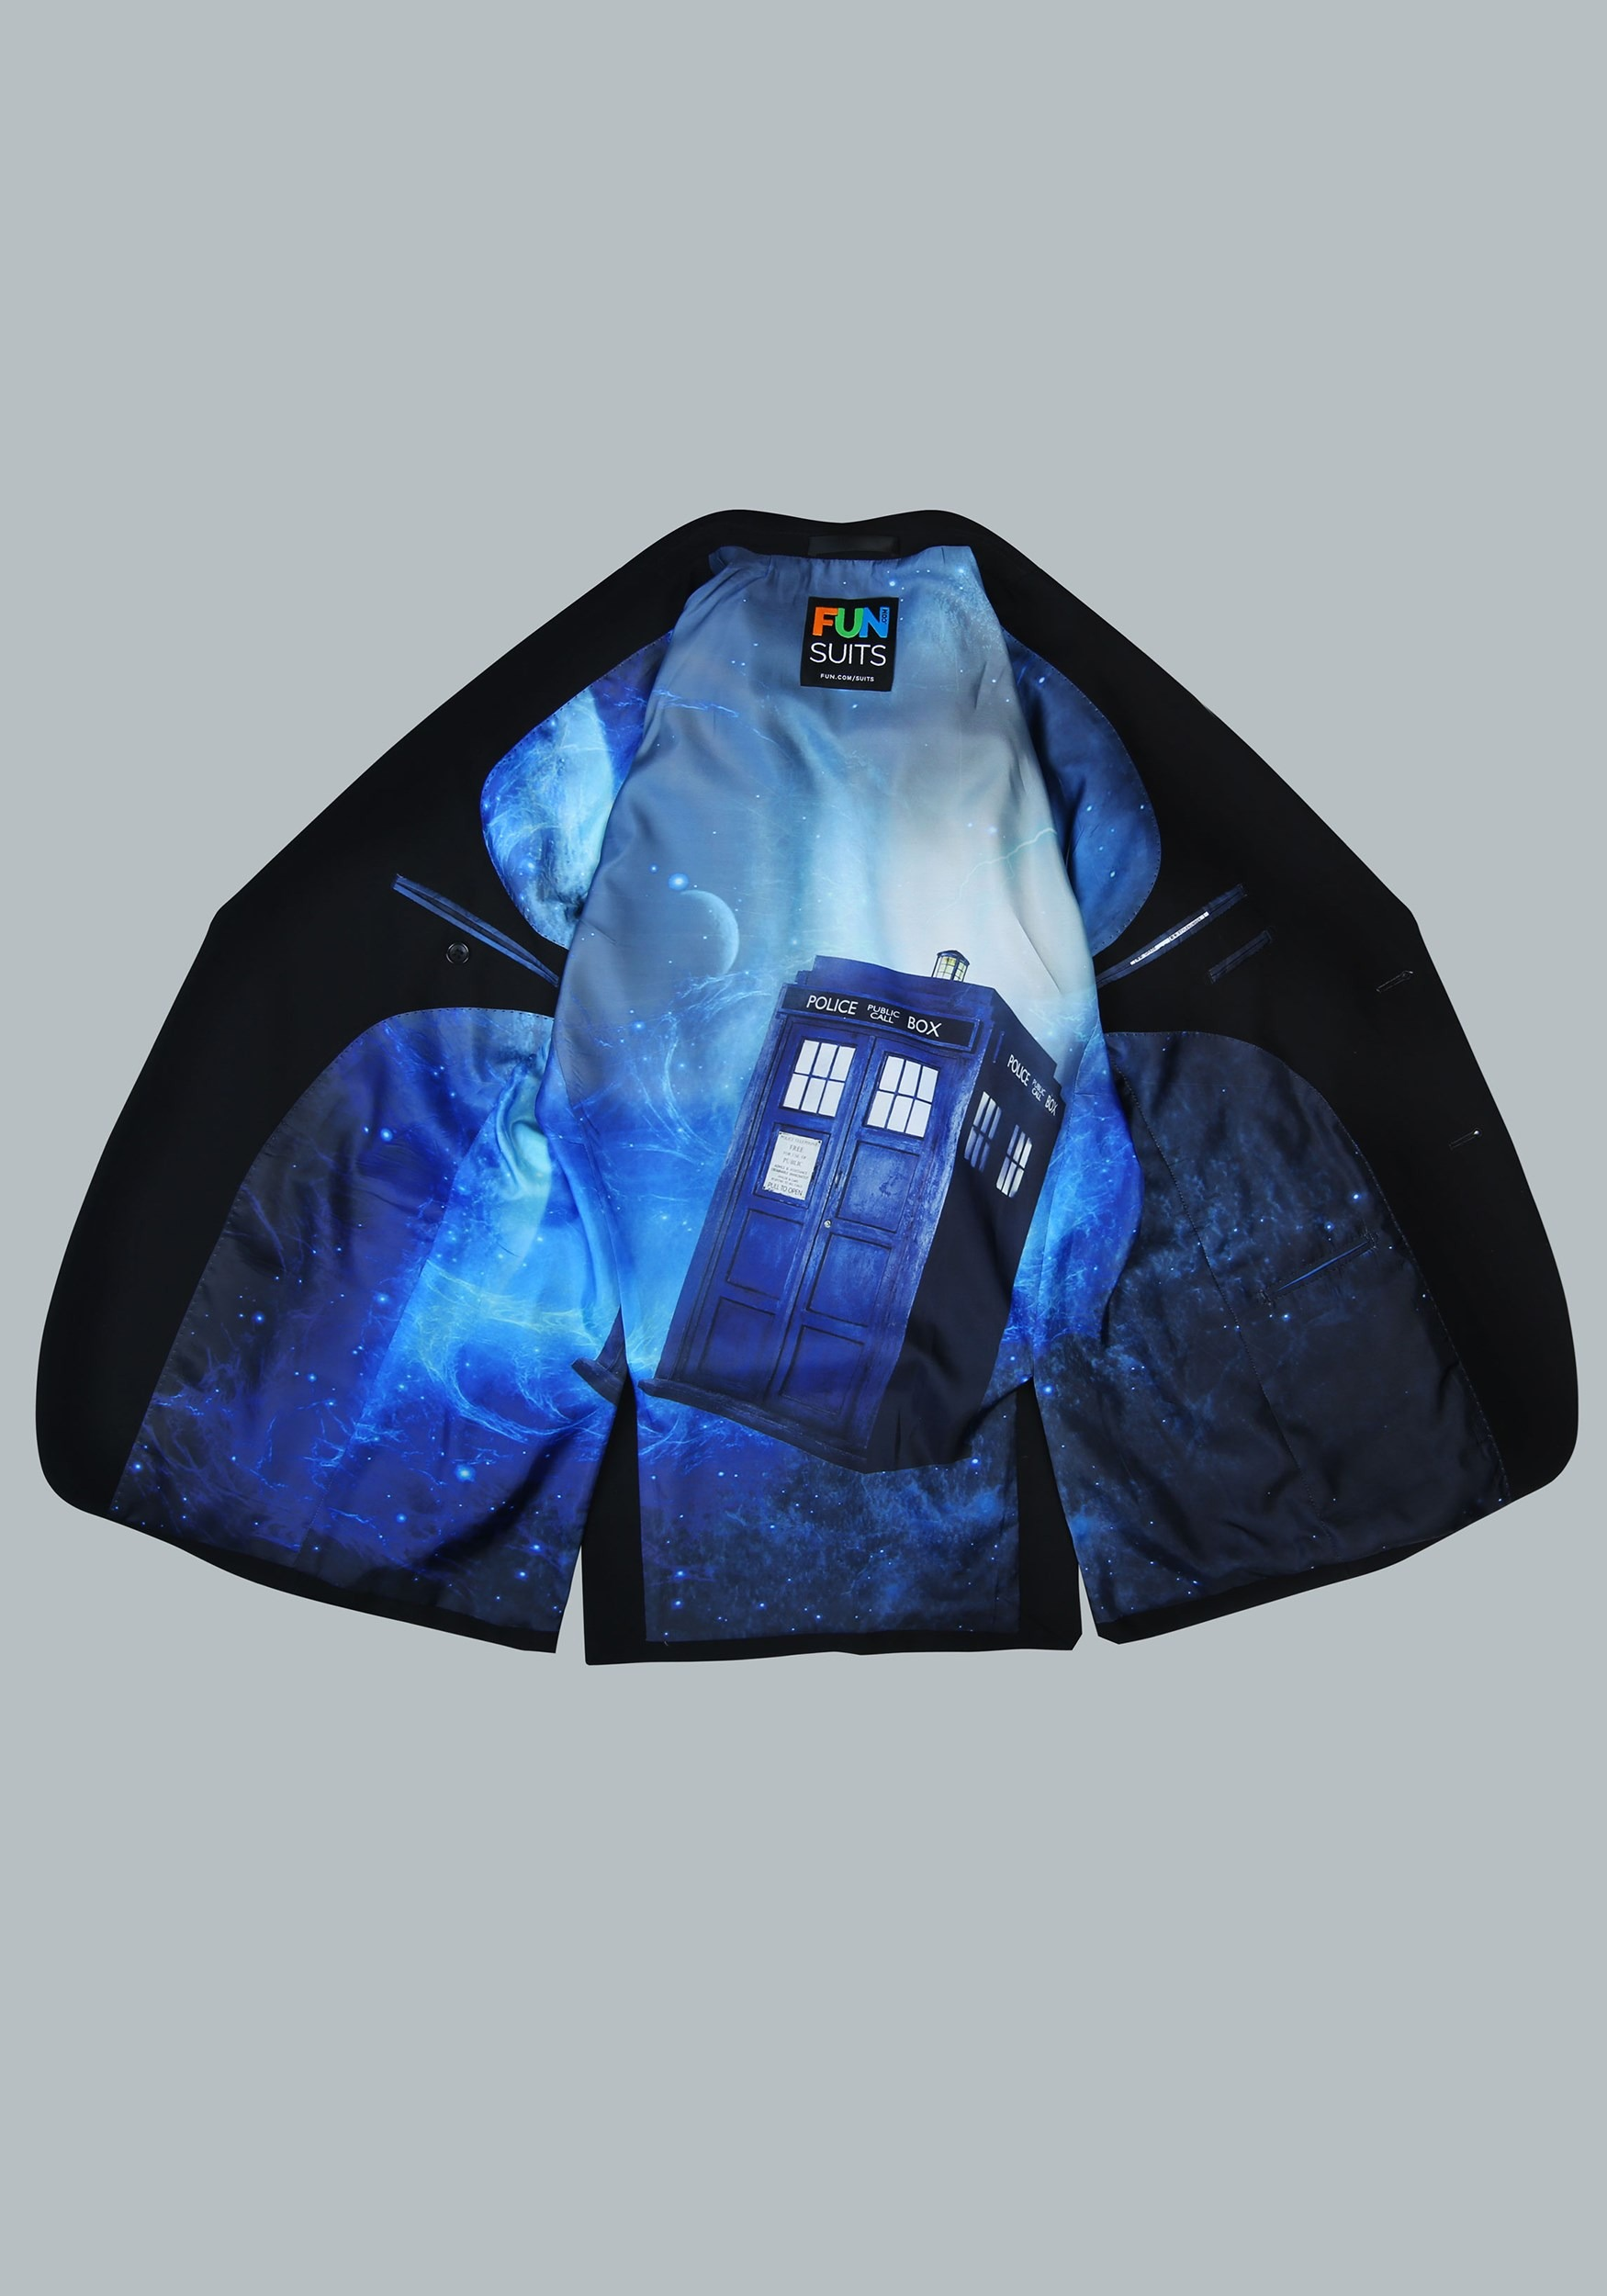 Dr. Who Tardis Pop Interior Suit Jacket